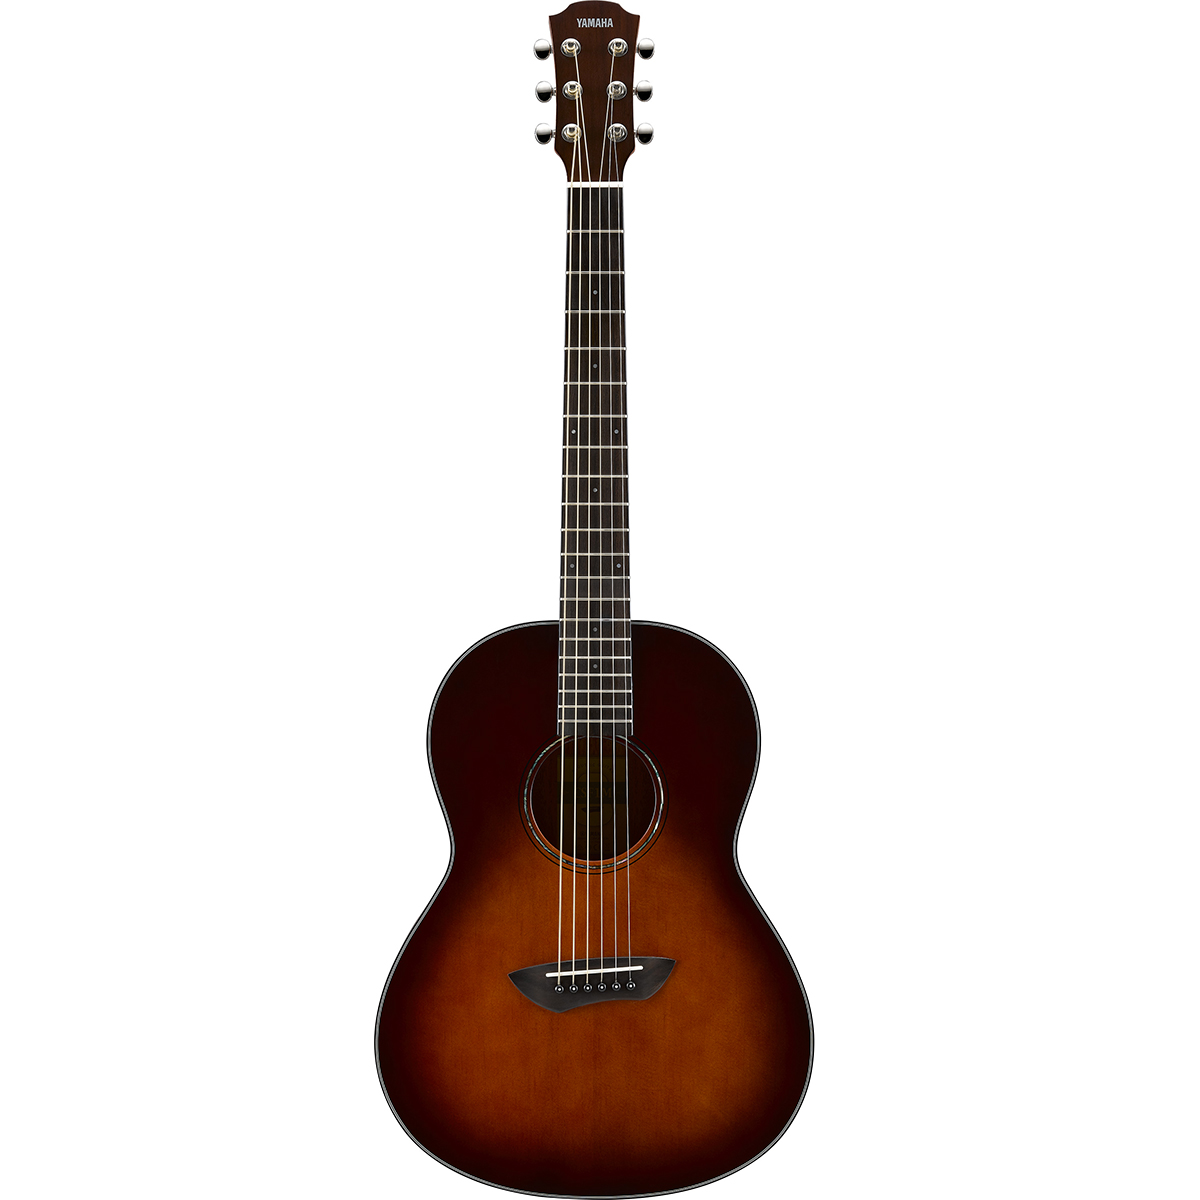 CSF1MTBS FOLK PARLOR TOBACO SB guitare Folk